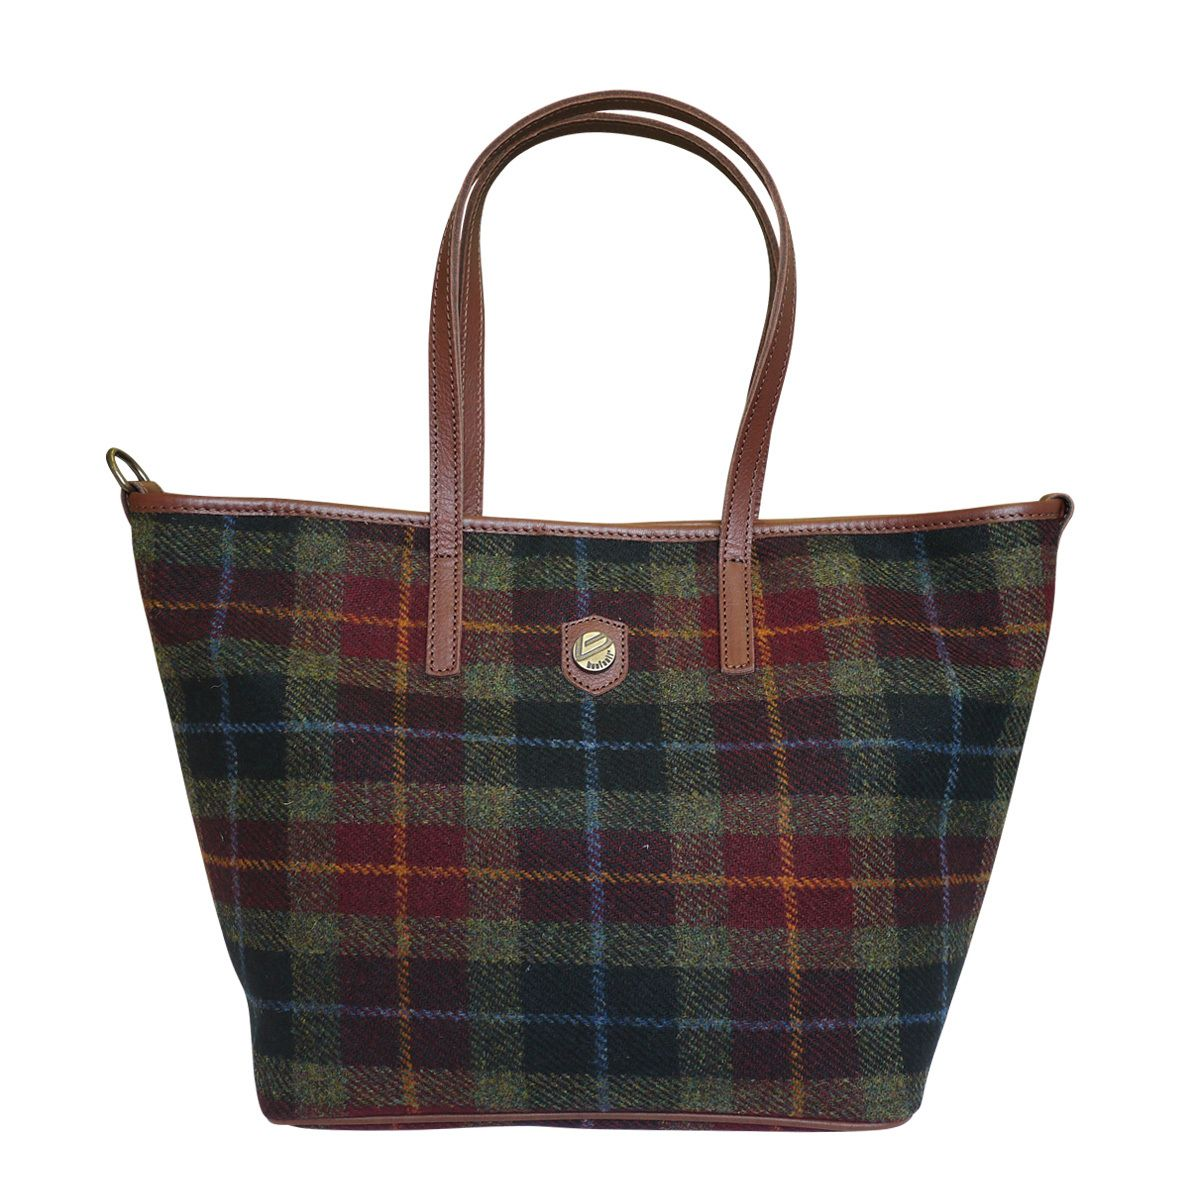 Attavanti - Bonfanti Leather and Harris Tweed Tote Shopper Handbag - Green and Red Tartan, £195.00 (http://www.attavanti.com/luxury-italian-leather-designer-handbags/bonfanti-leather-and-harris-tweed-tote-shopper-handbag-green-and-red-tartan/)